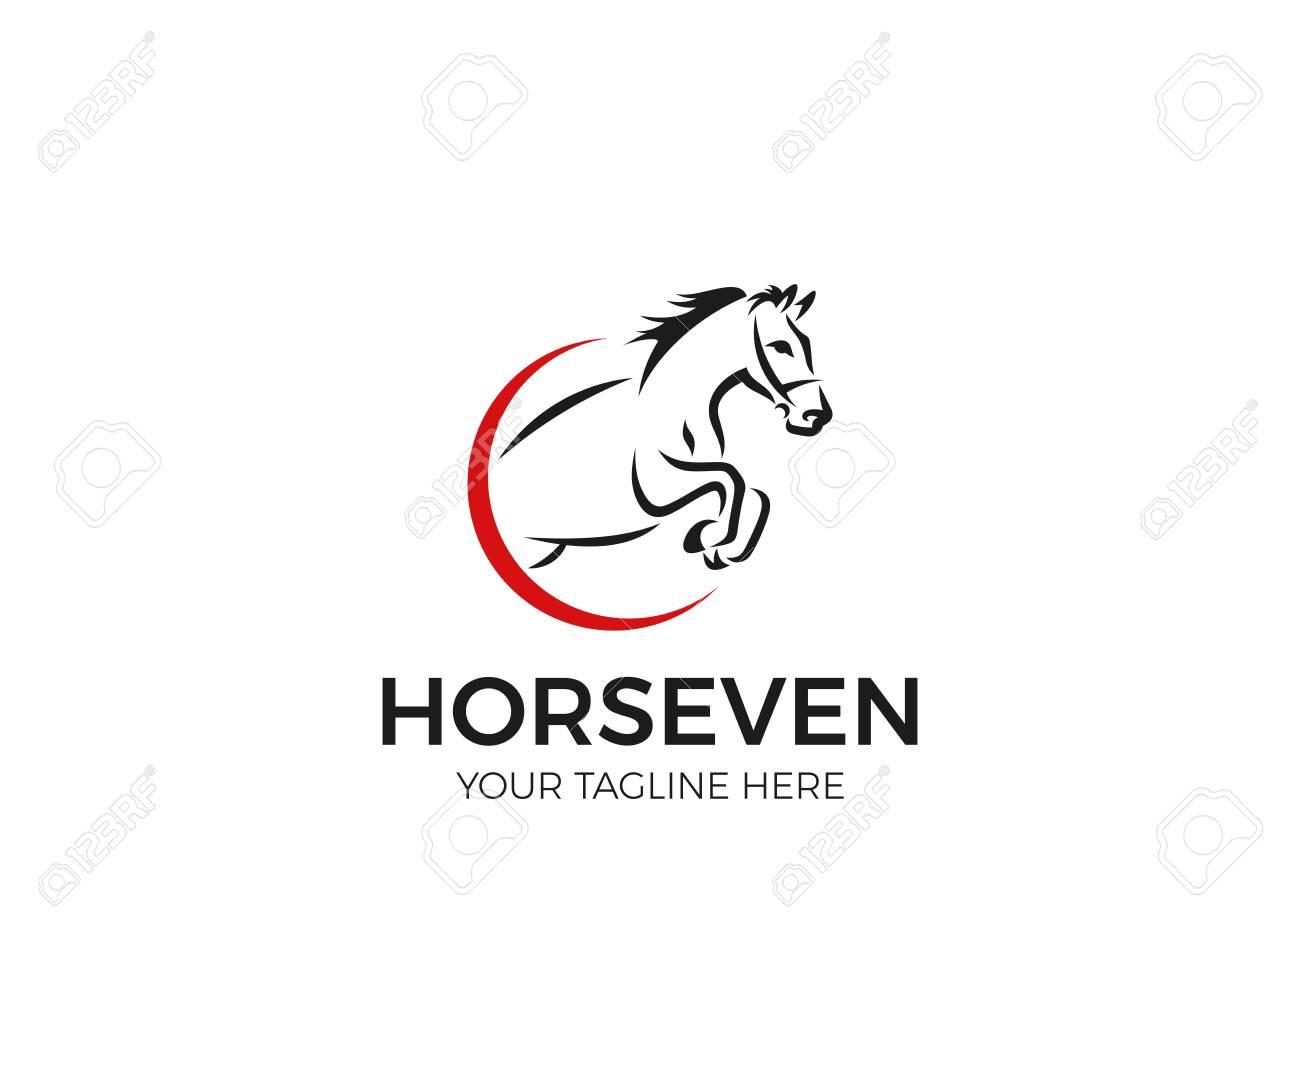 Jumping Horse Logo Template Line Animal Vector Design Pet Circular Royalty Free Cliparts Vectors And Stock Illustration Image 89978365